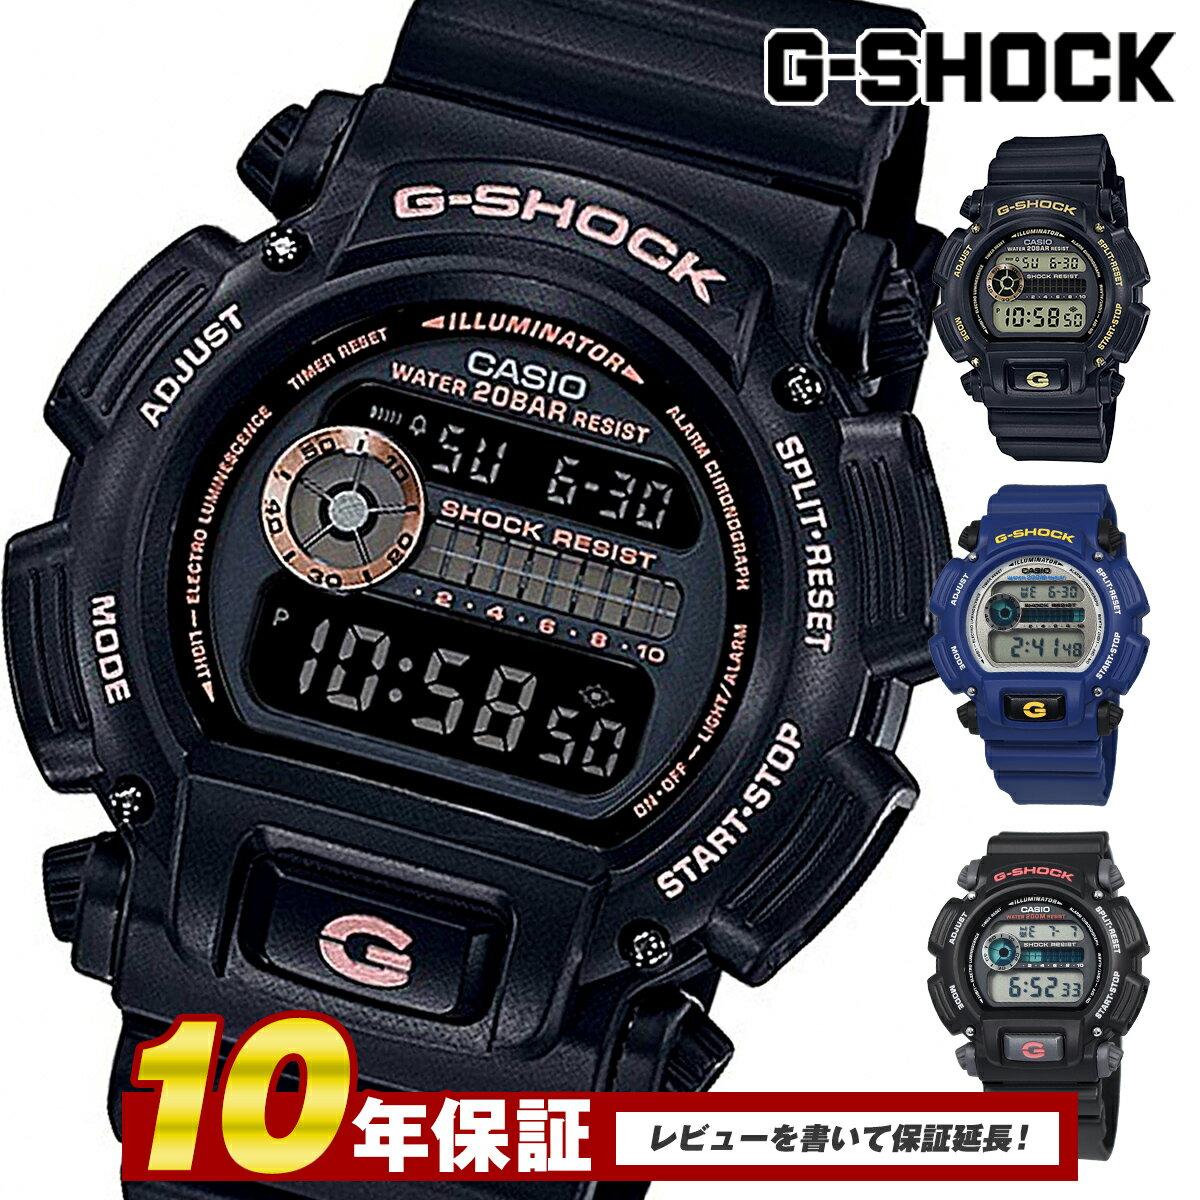 腕時計, メンズ腕時計  10g G G-SHOCK DW-9052-1V DW-9052-2V DW-9052GBX-1A4 DW-9052GBX-1A9 CASIO